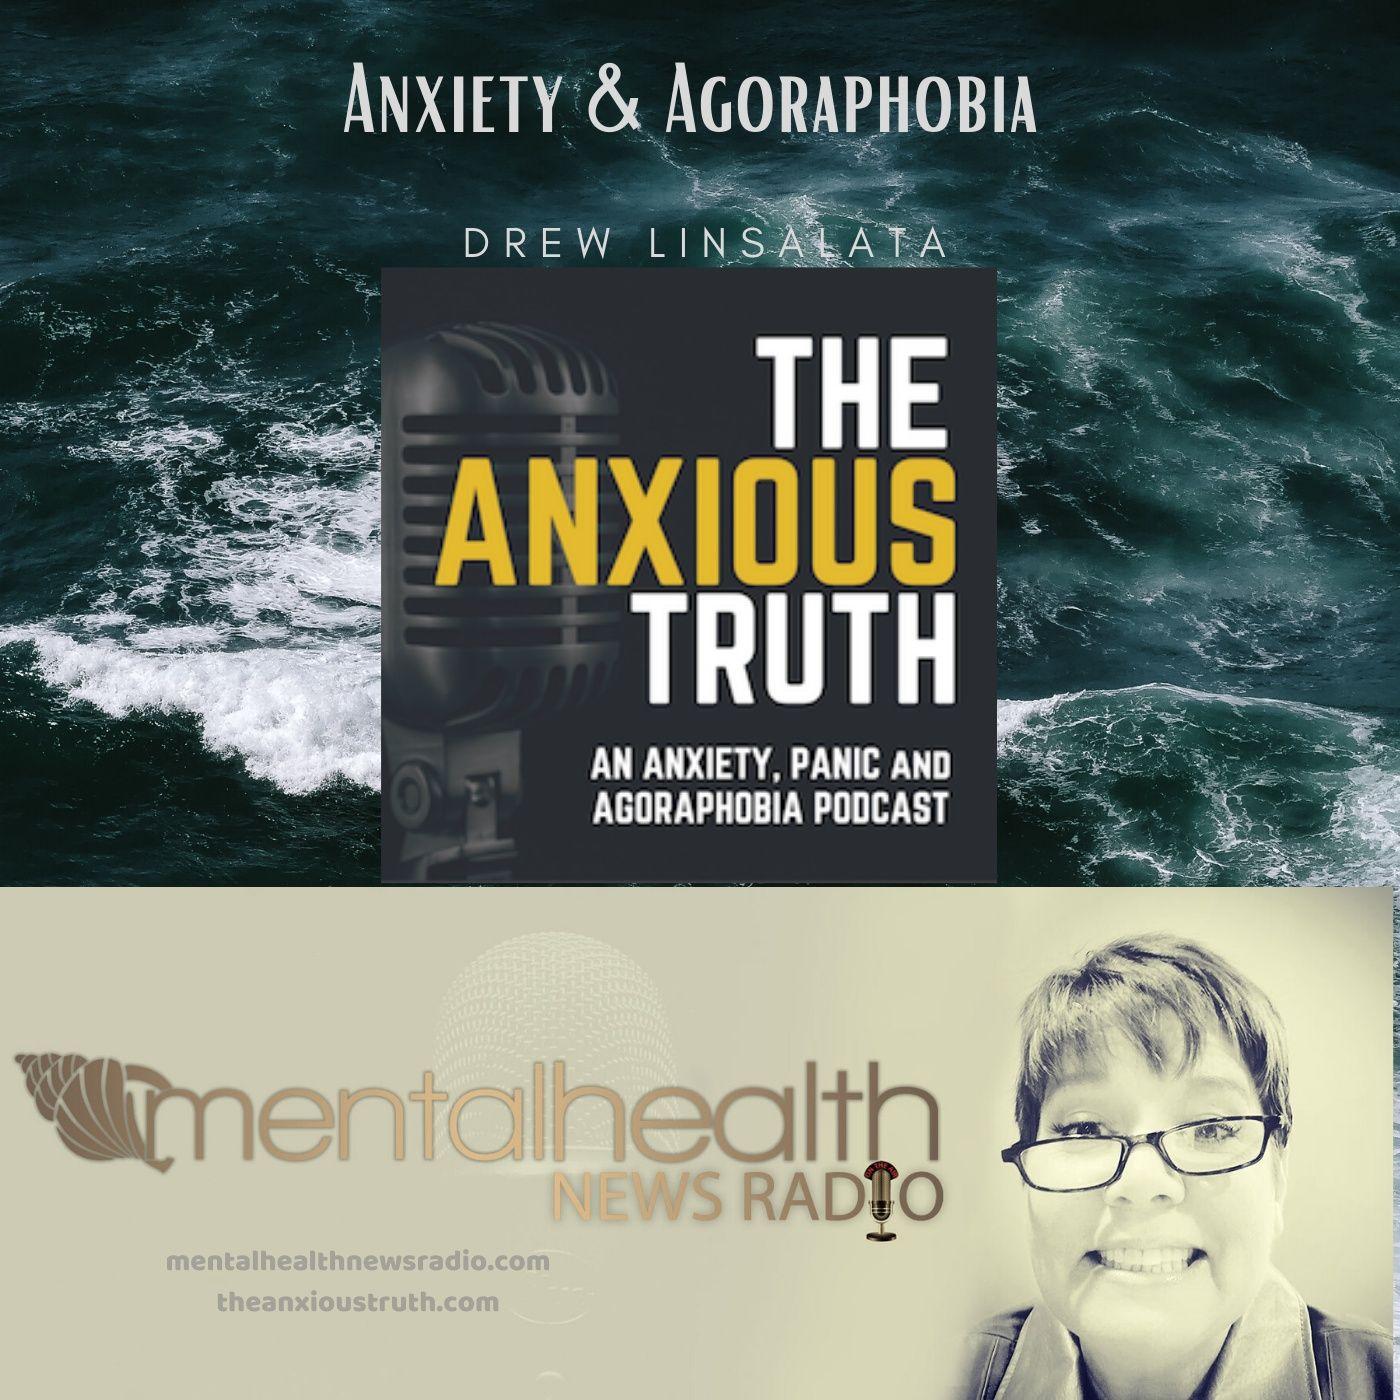 Mental Health News Radio - Anxiety and Agoraphobia with Drew Linsalata